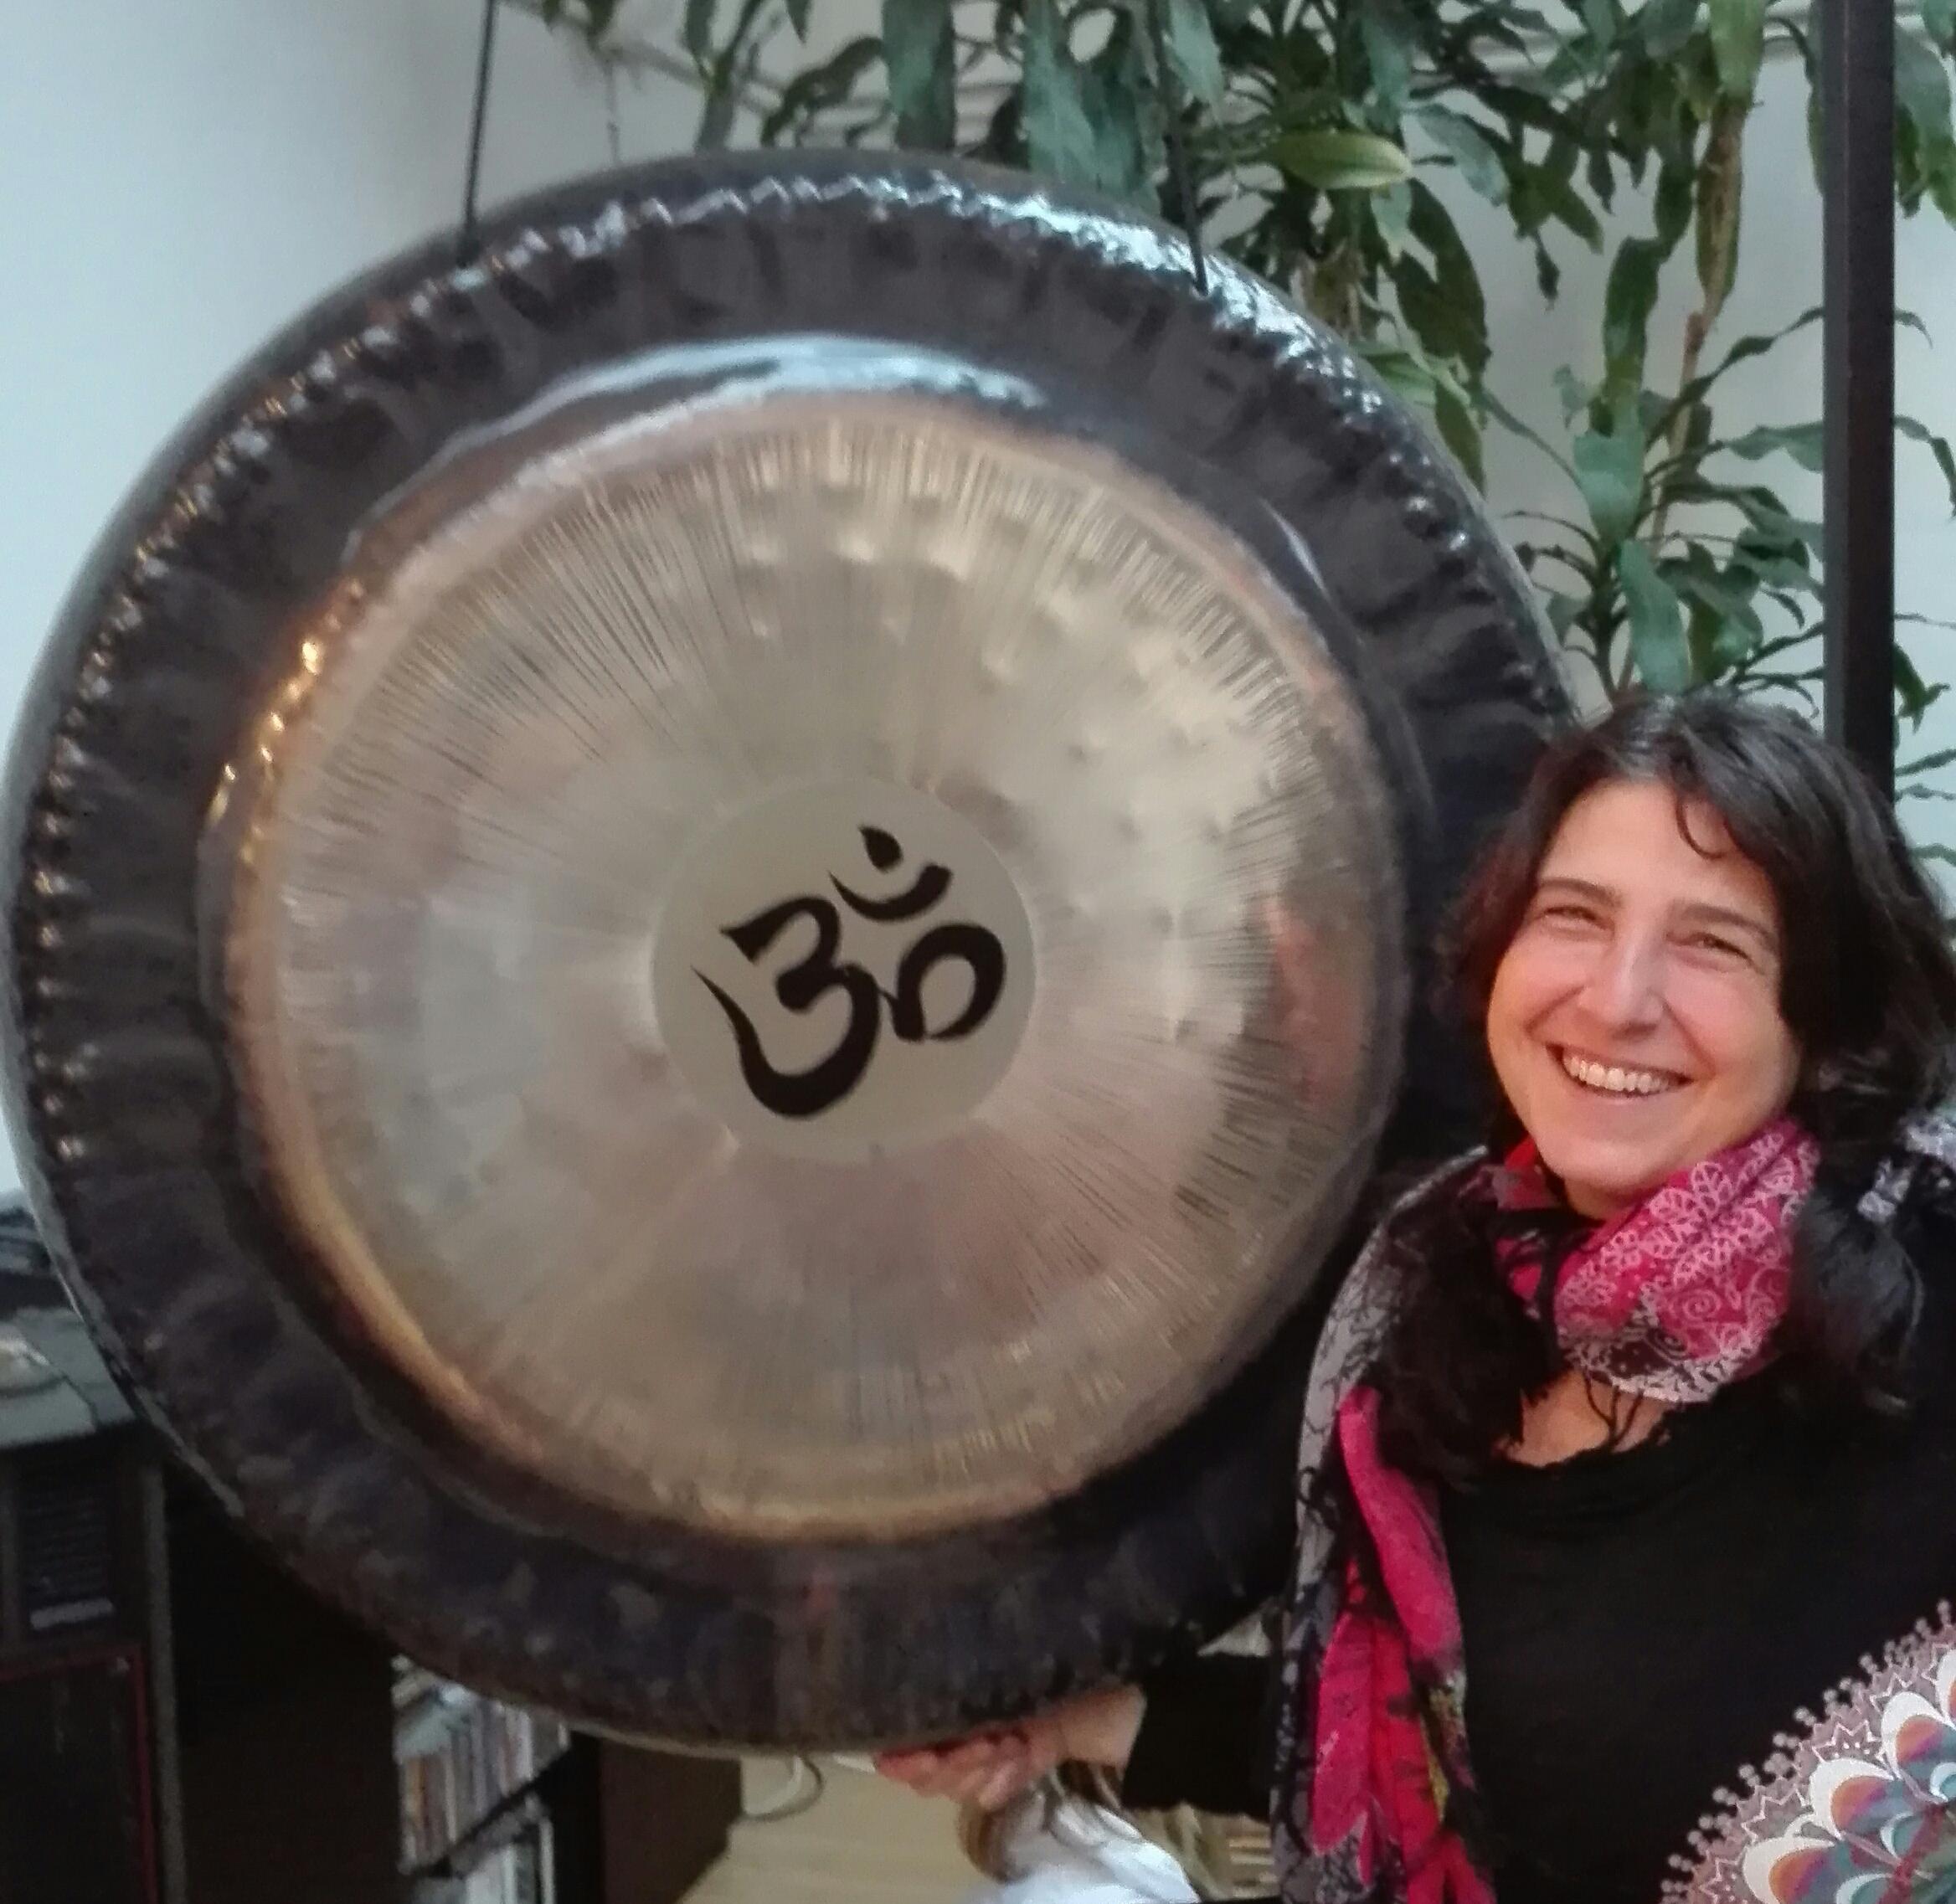 Seminario hatha yoga archives ashtanga yoga modena asd - Bagno di gong effetti negativi ...